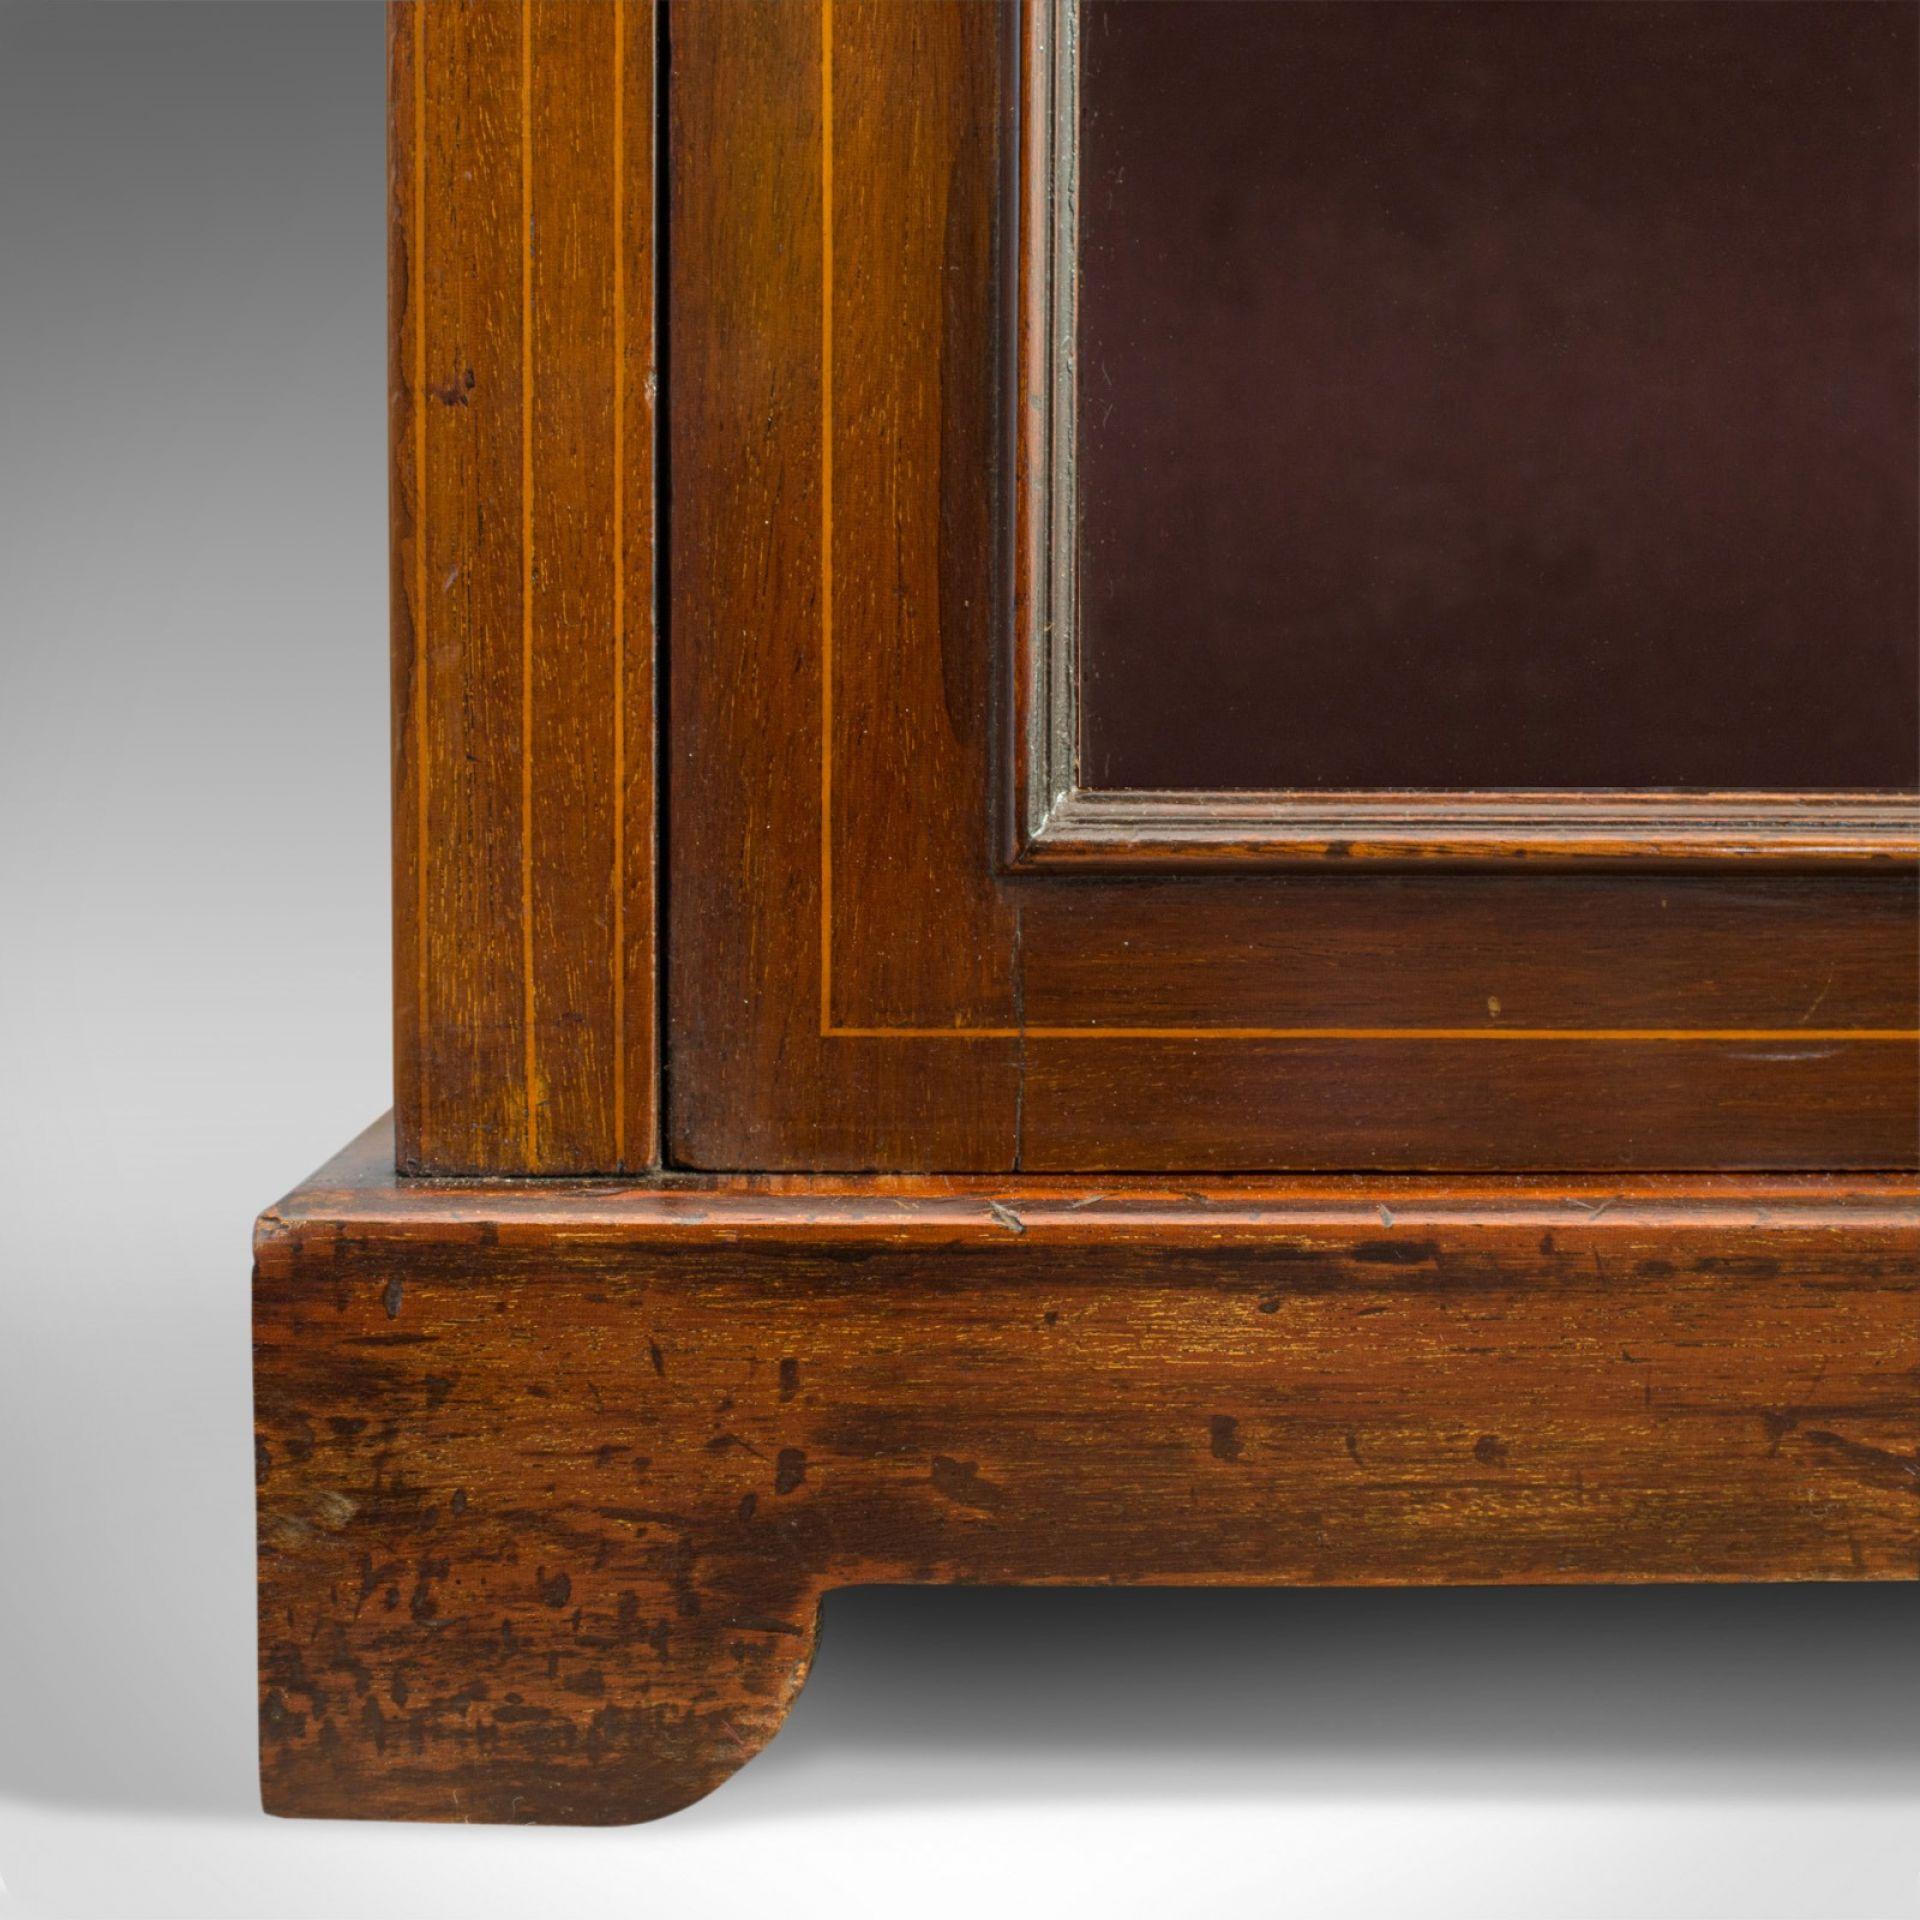 Antique Pier Cabinet, English, Mahogany, Display, Showcase, Late 19th Century